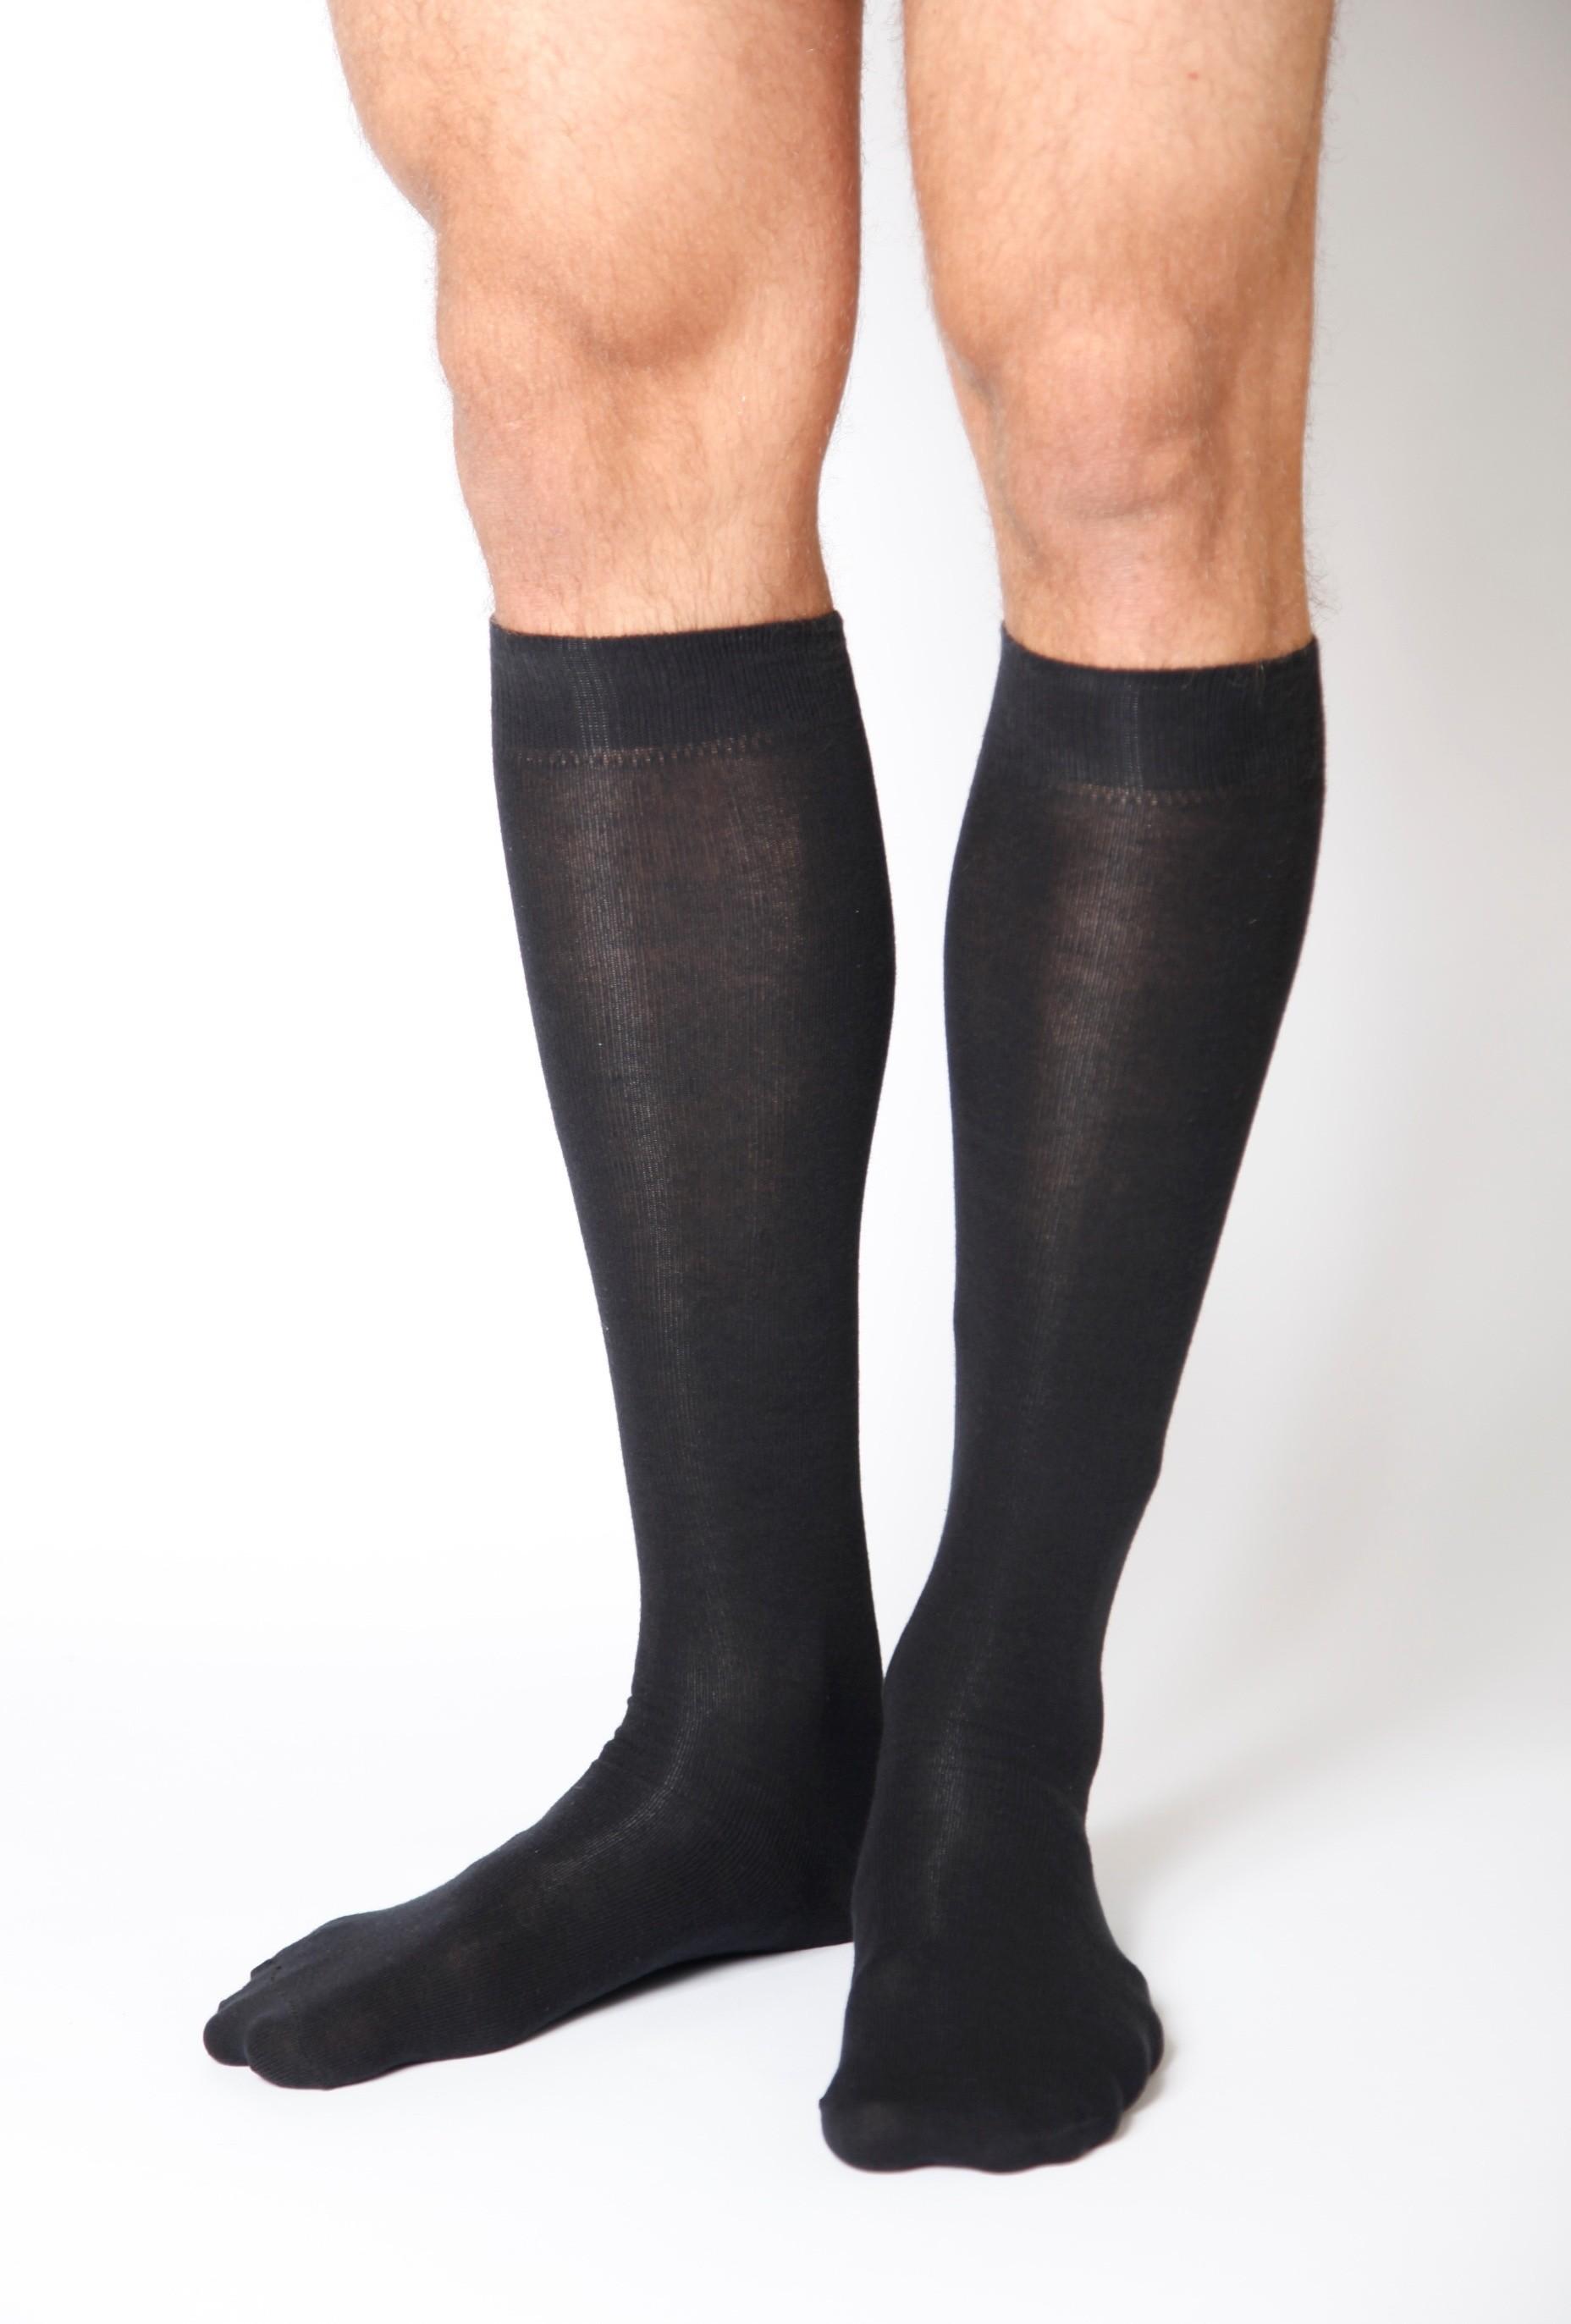 Men's cotton knee-highs, black